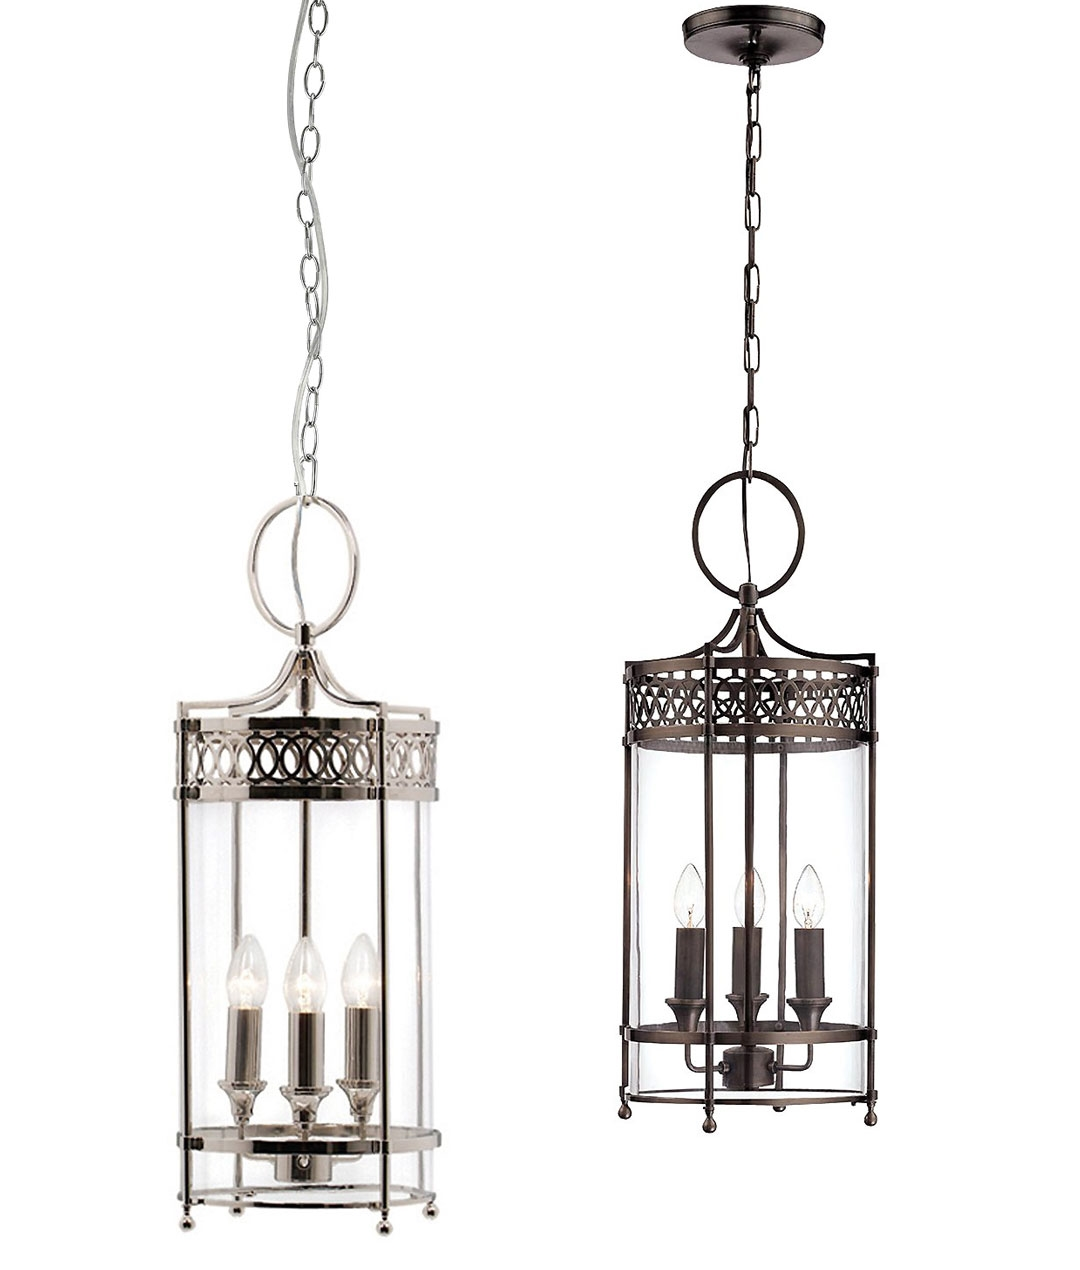 Chain Suspended Georgian Style Hallway Lantern